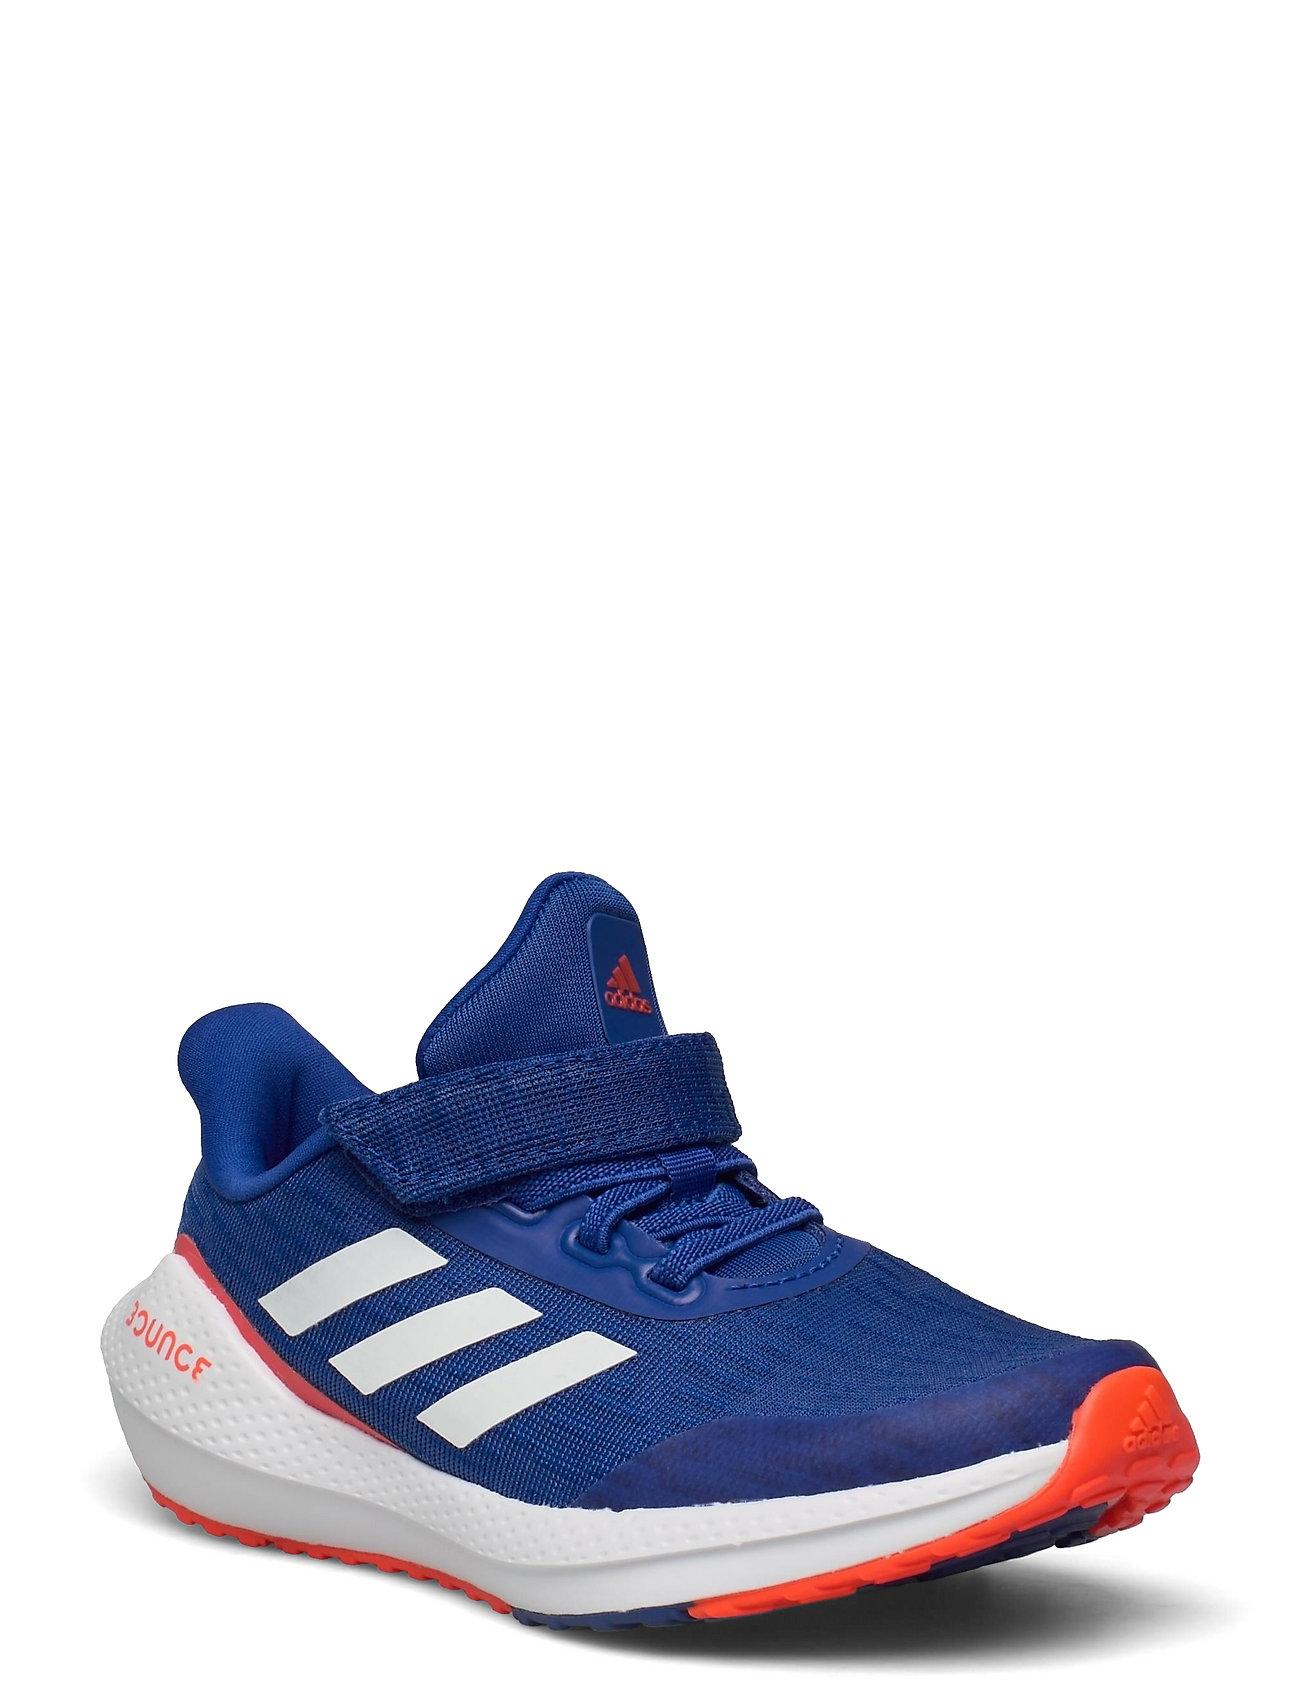 Eq21 Run Shoes Sports Shoes Running/training Shoes Blå Adidas Performance